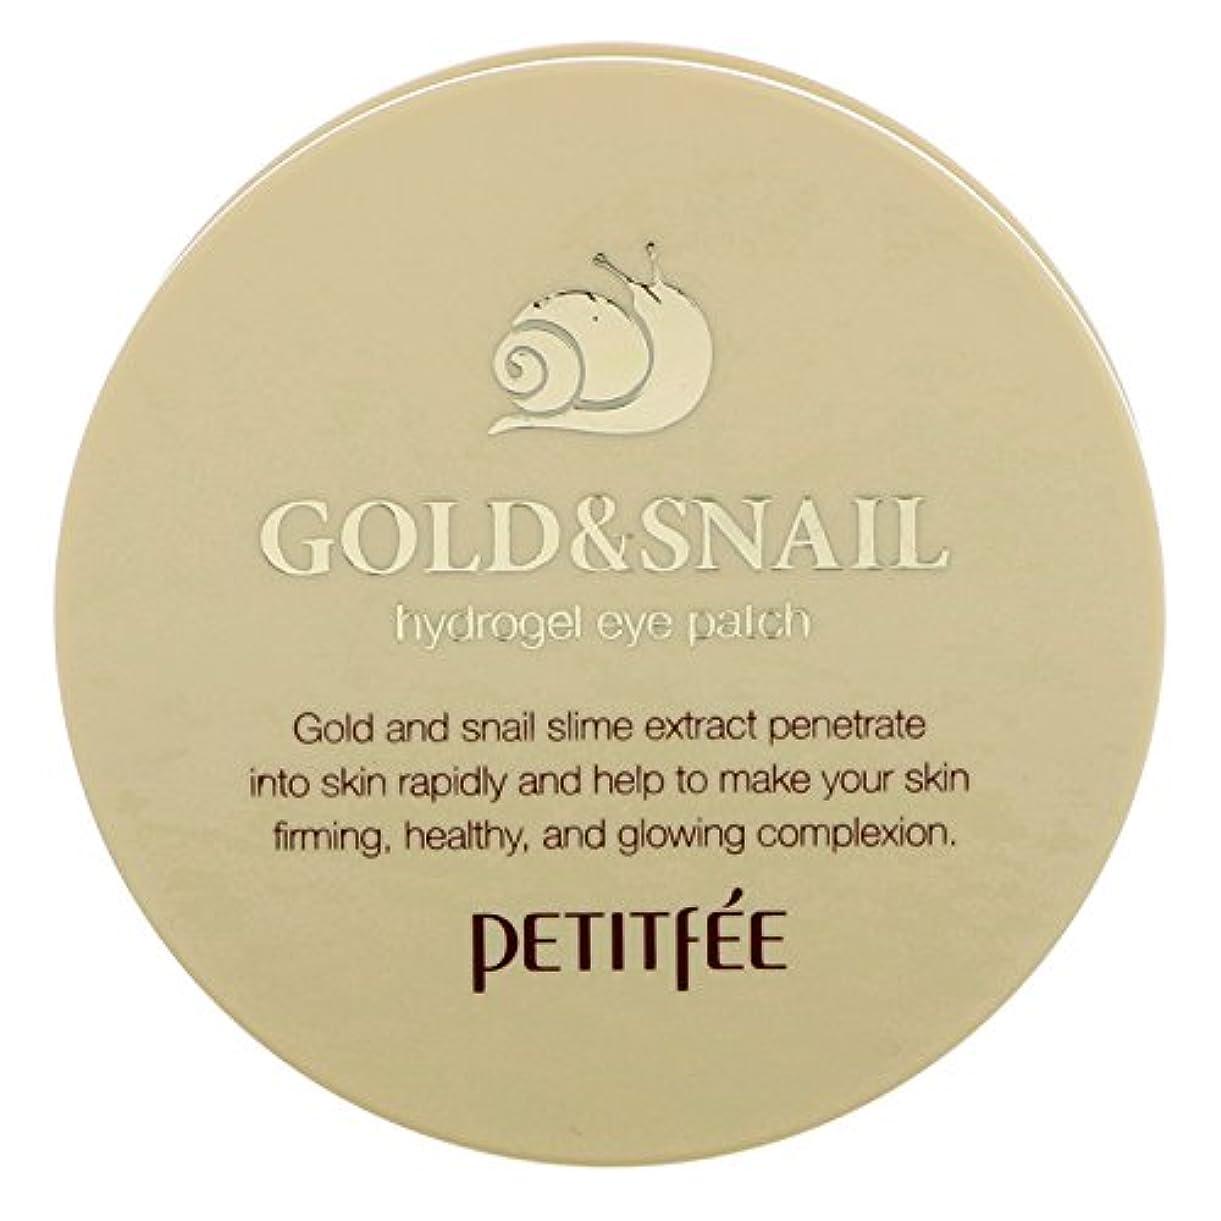 PETITFEE Gold and Snail Hydrogel Eye Patch (並行輸入品)